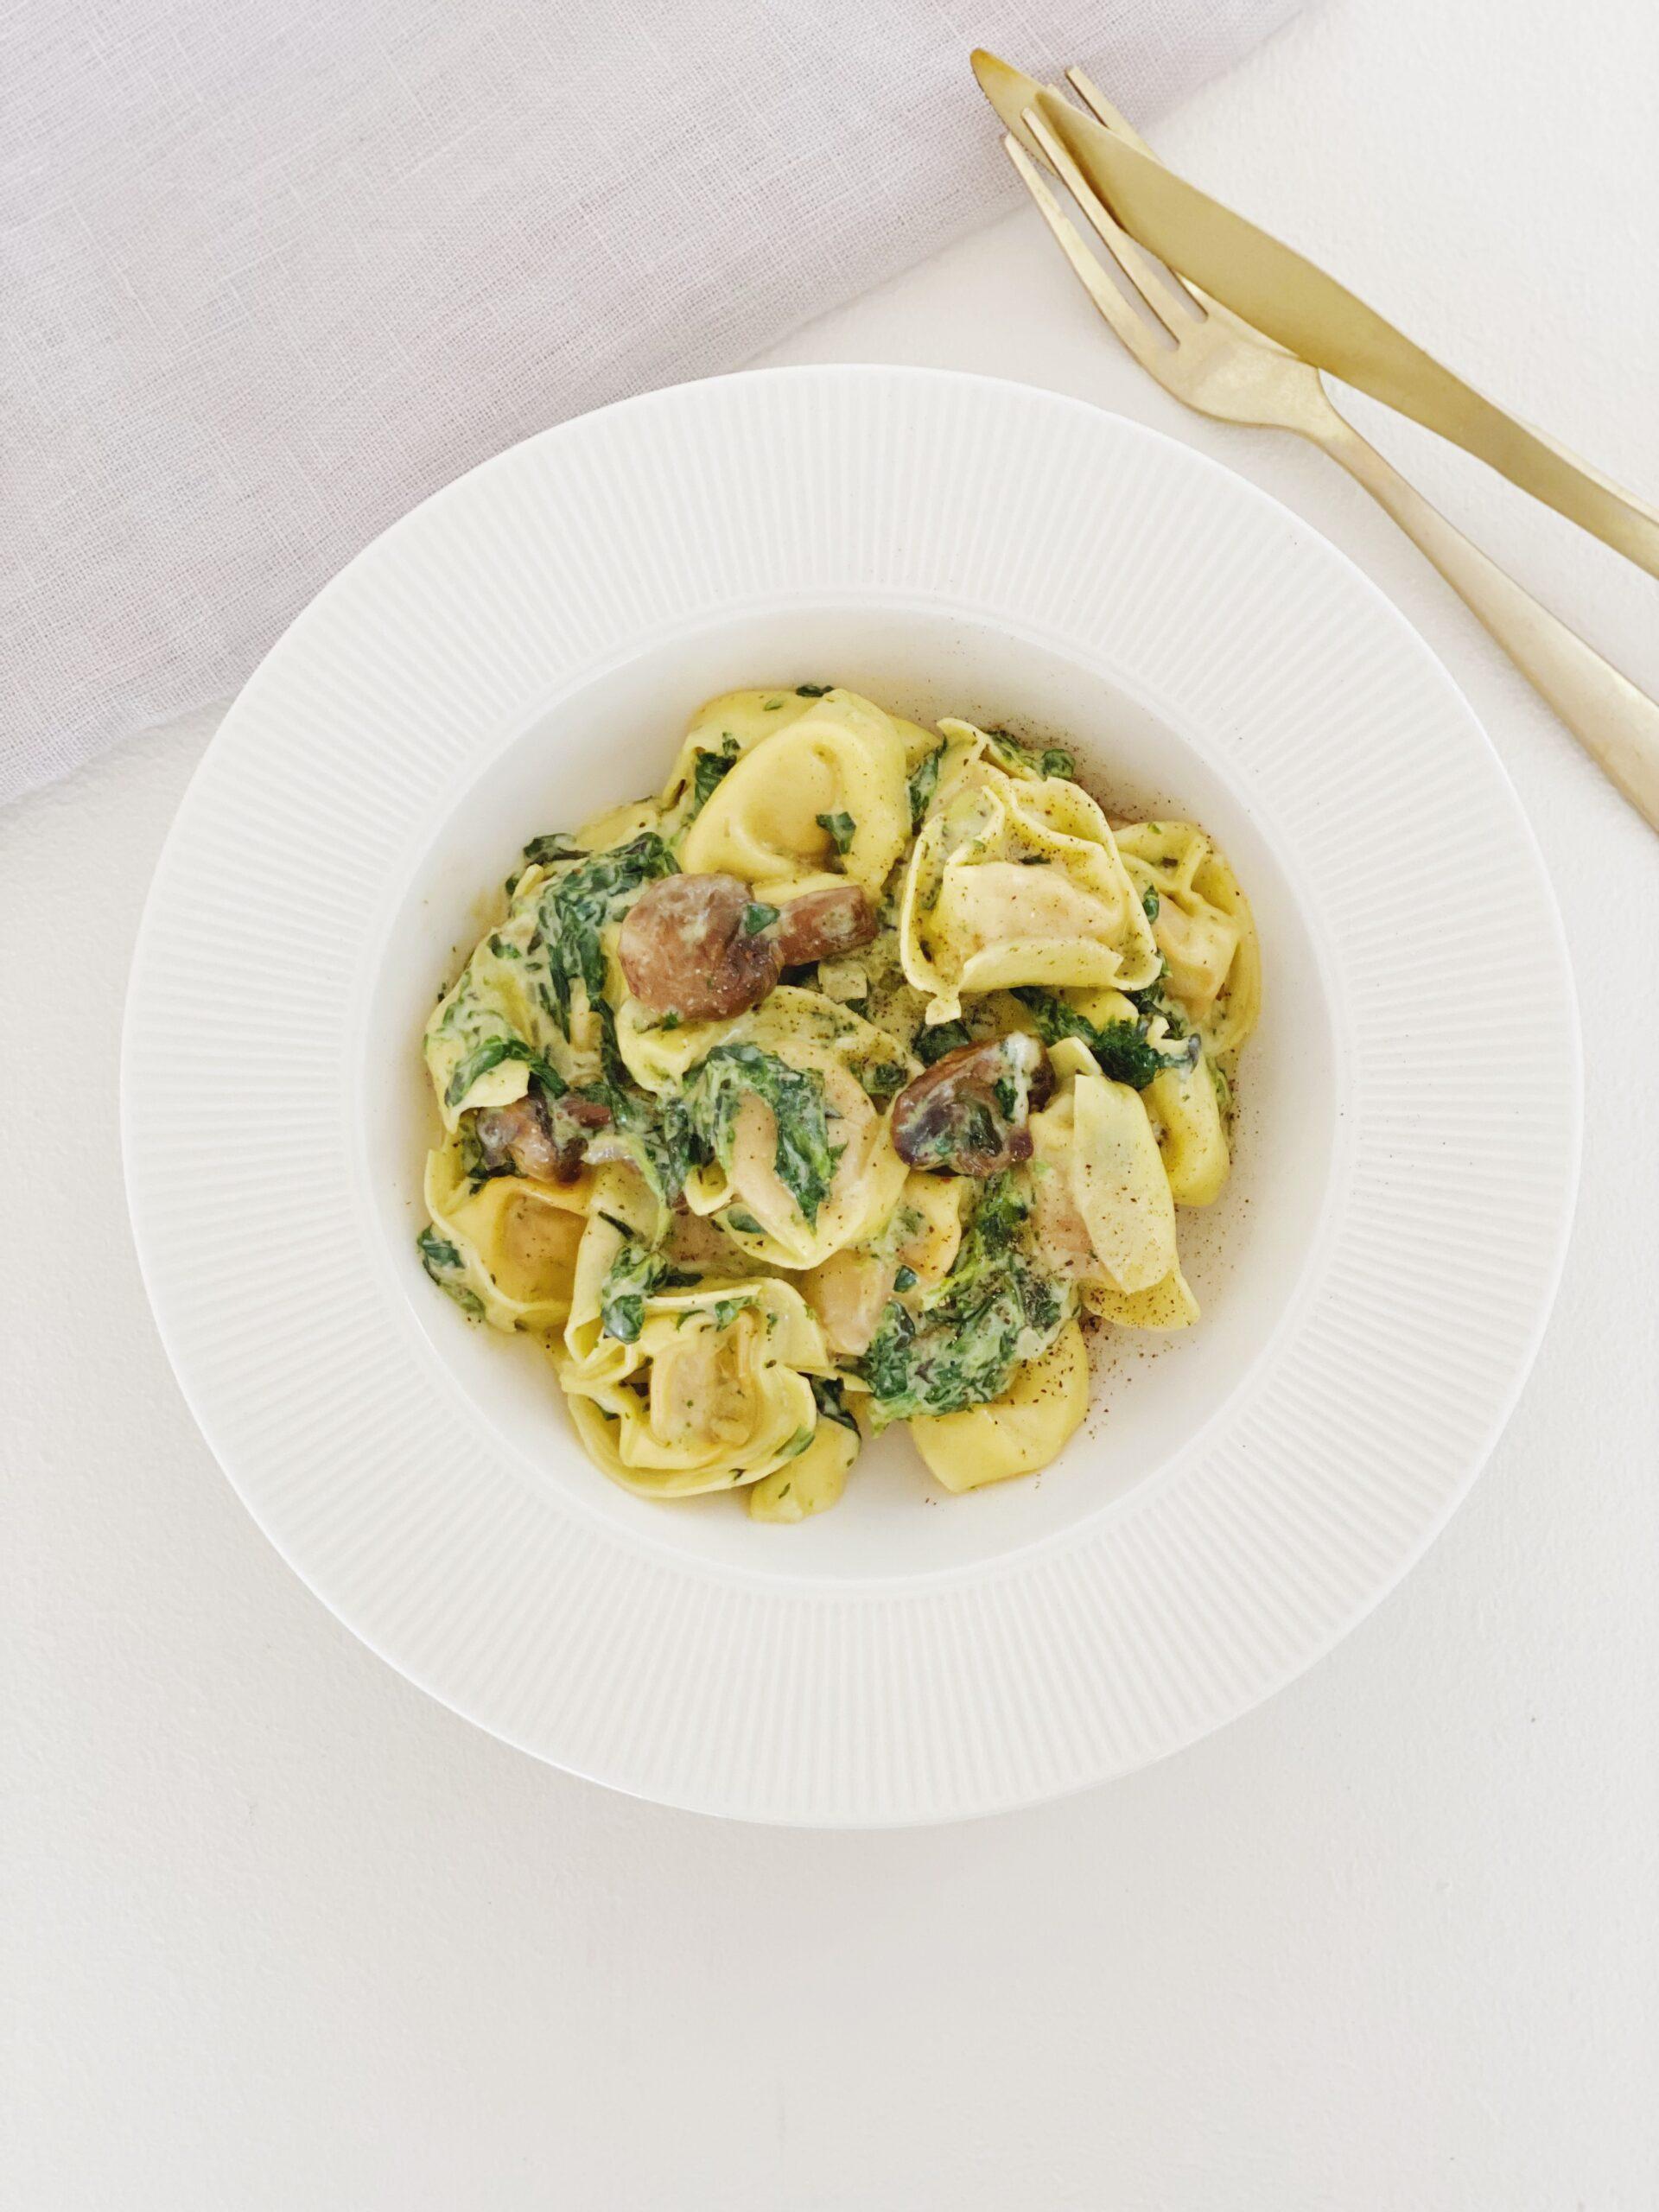 Tortellini-ret ,ed spinat og svampe set fra oven